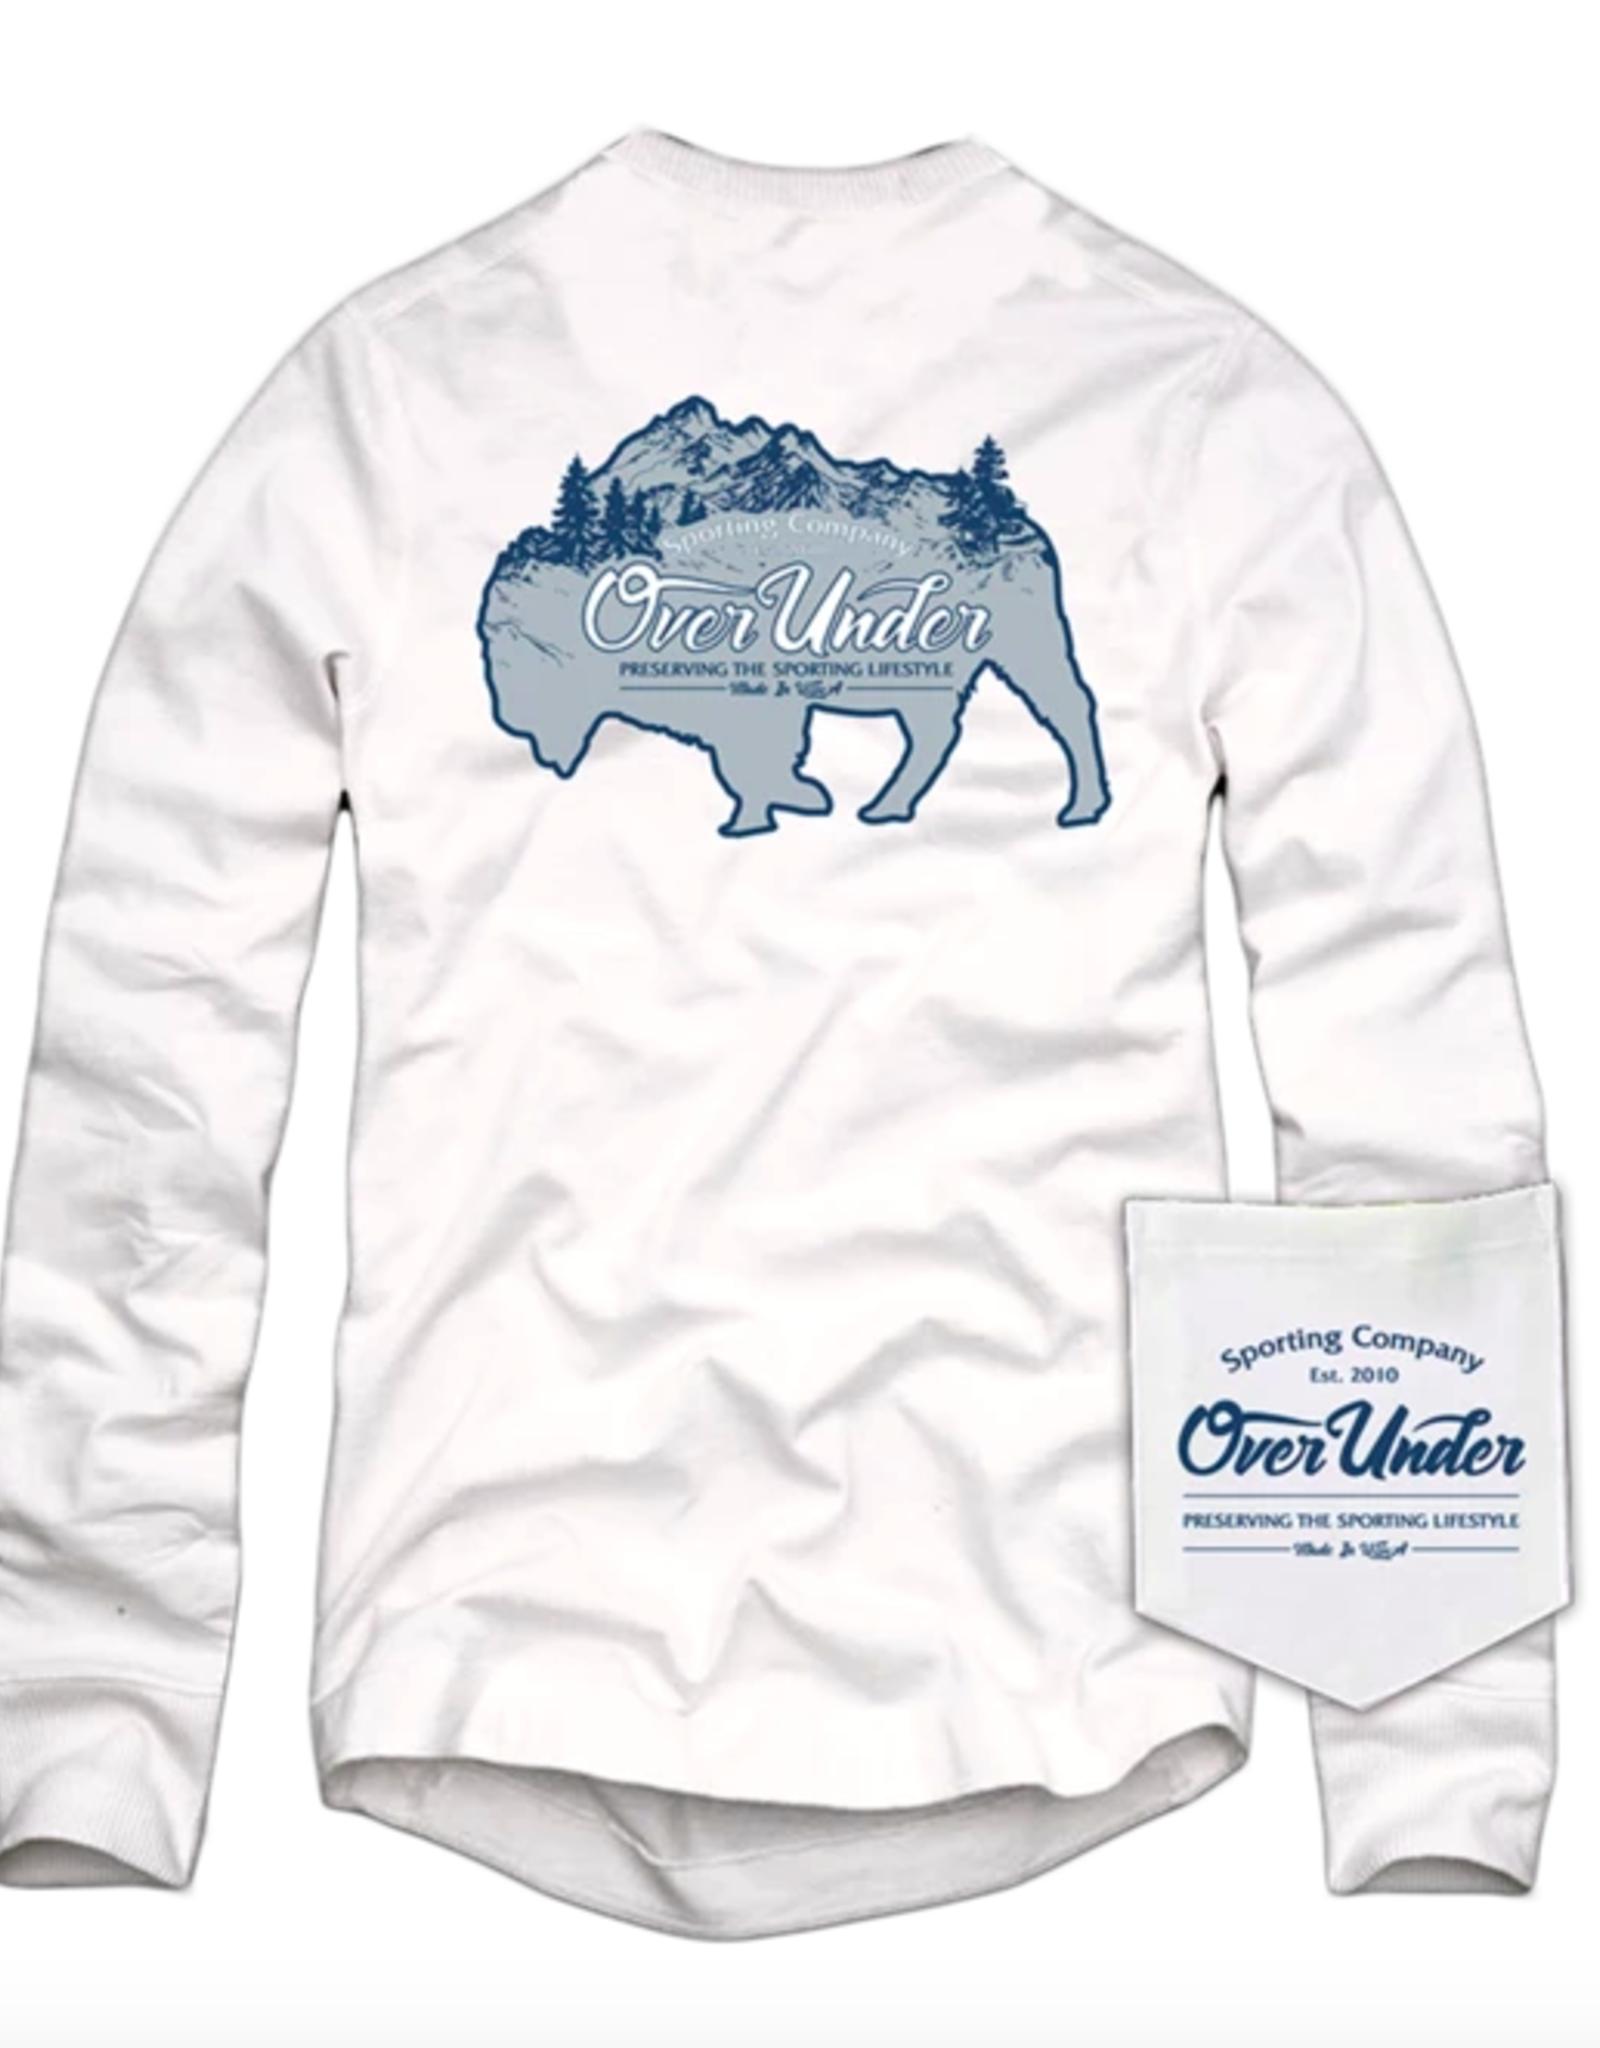 Over Under L/S Teton Bison T-Shirt